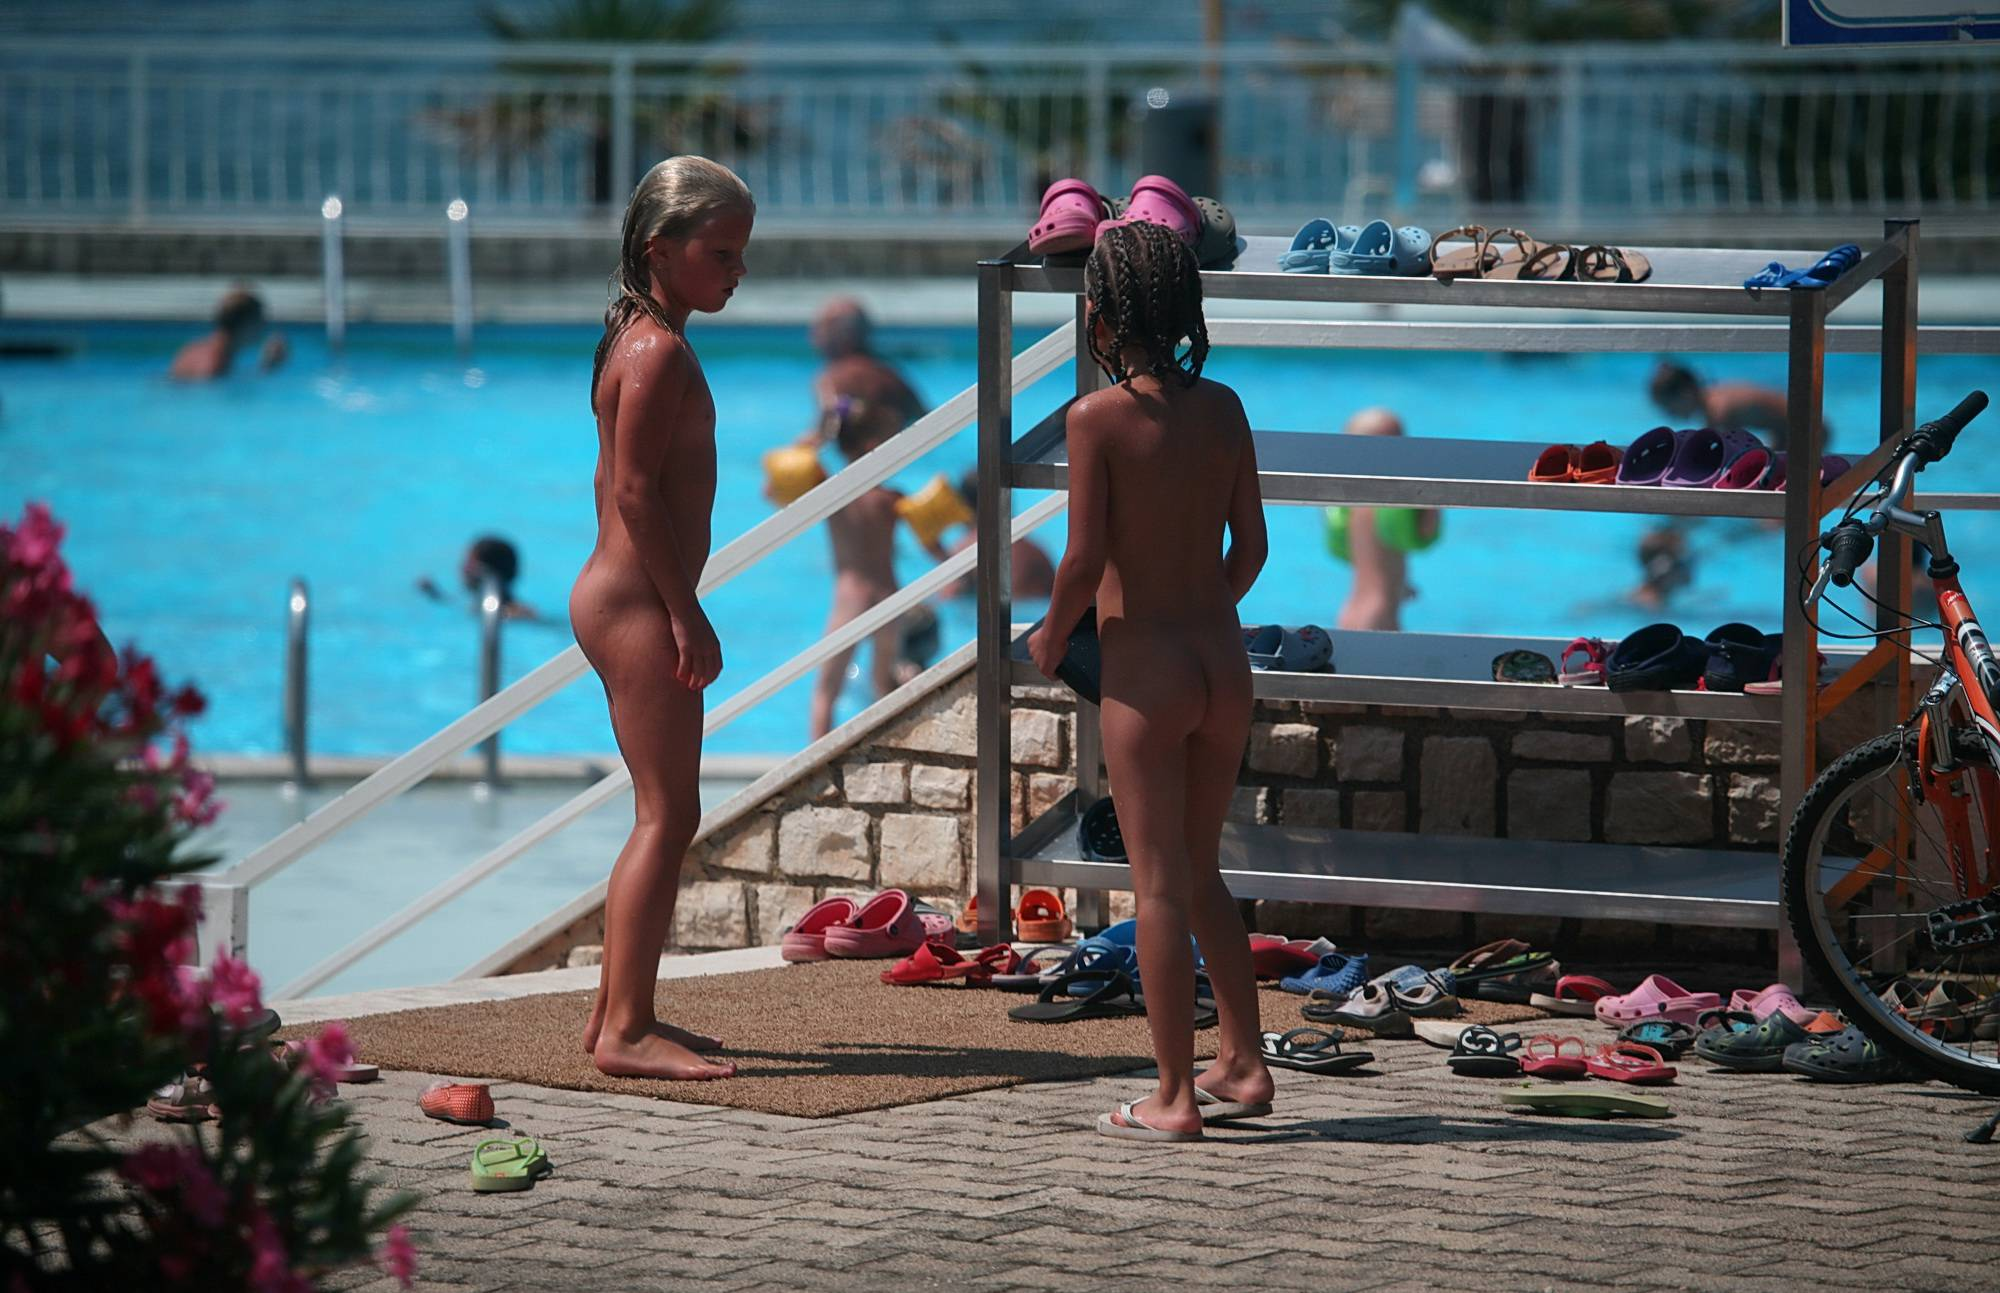 Couple of Nudists Playing - 2